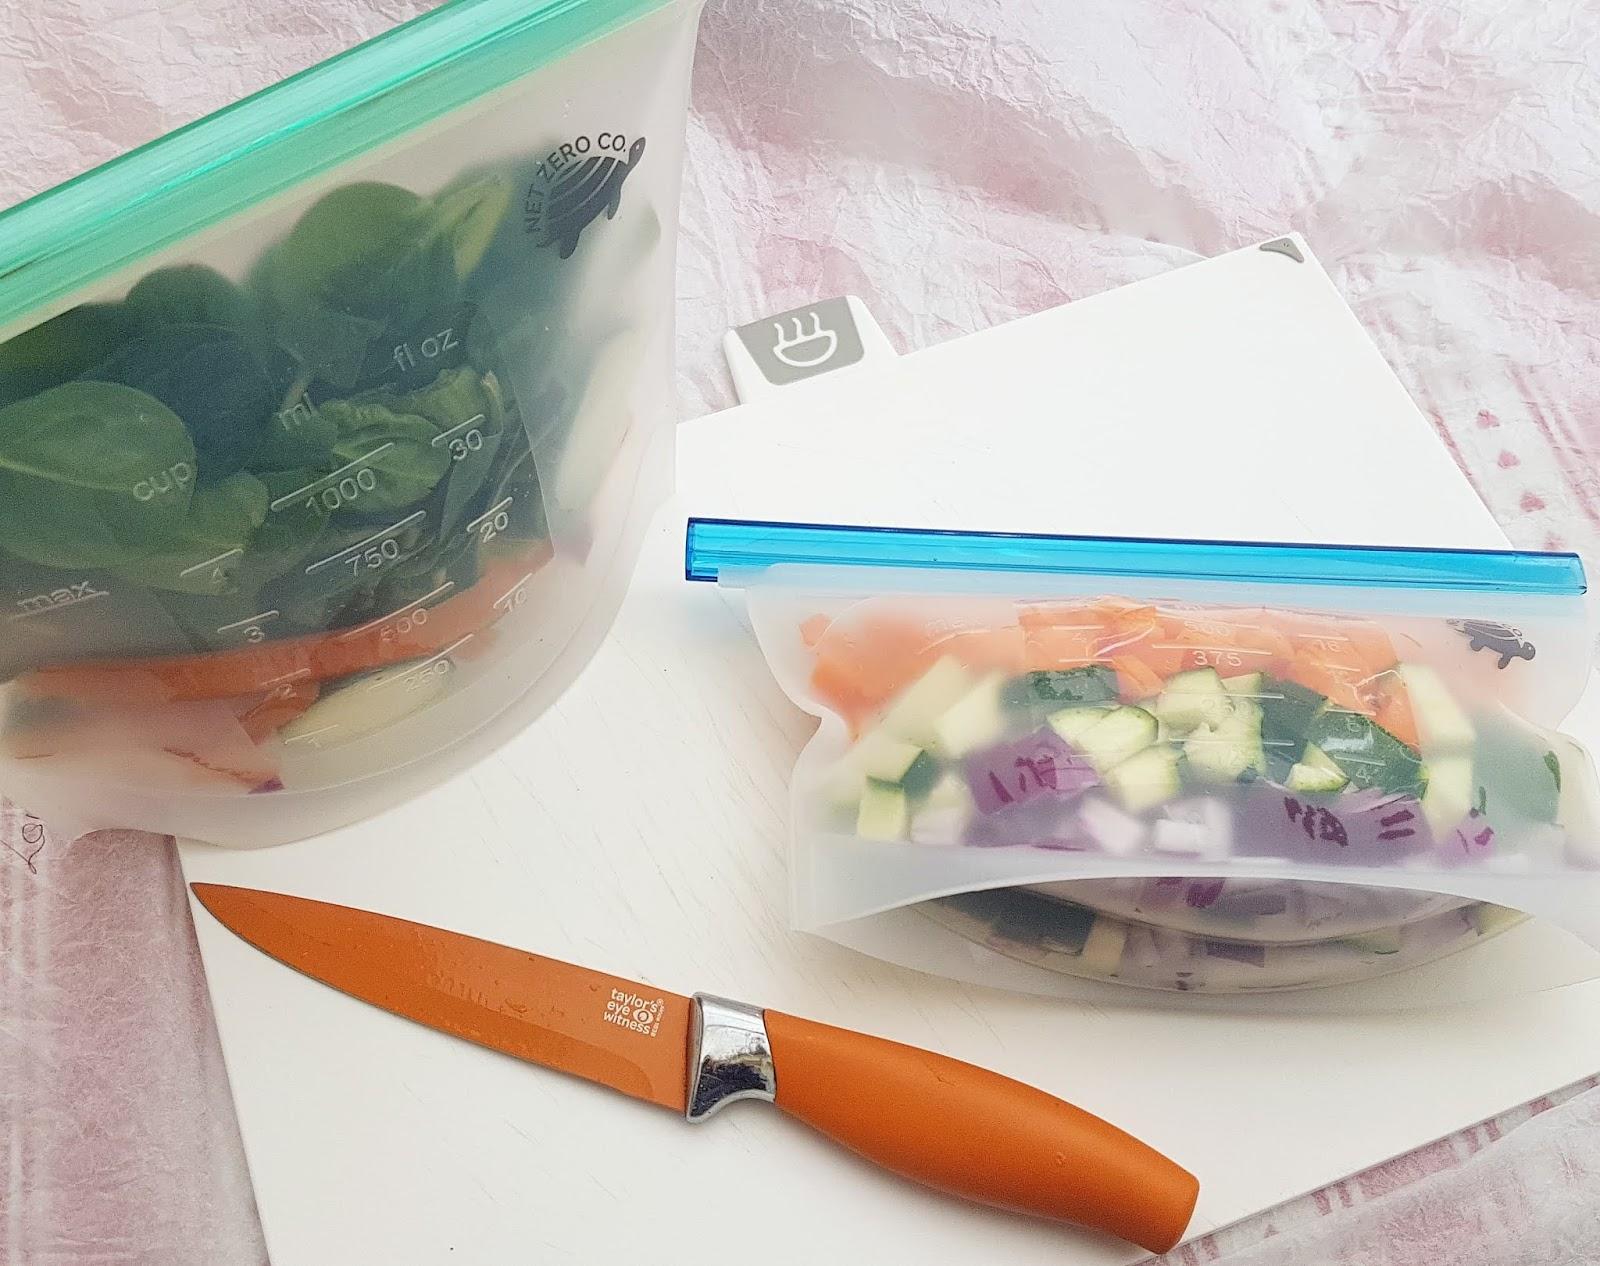 Net Zero Co Review - Zero Waste Reusable Silicone Sealer Bags - minimize food waste